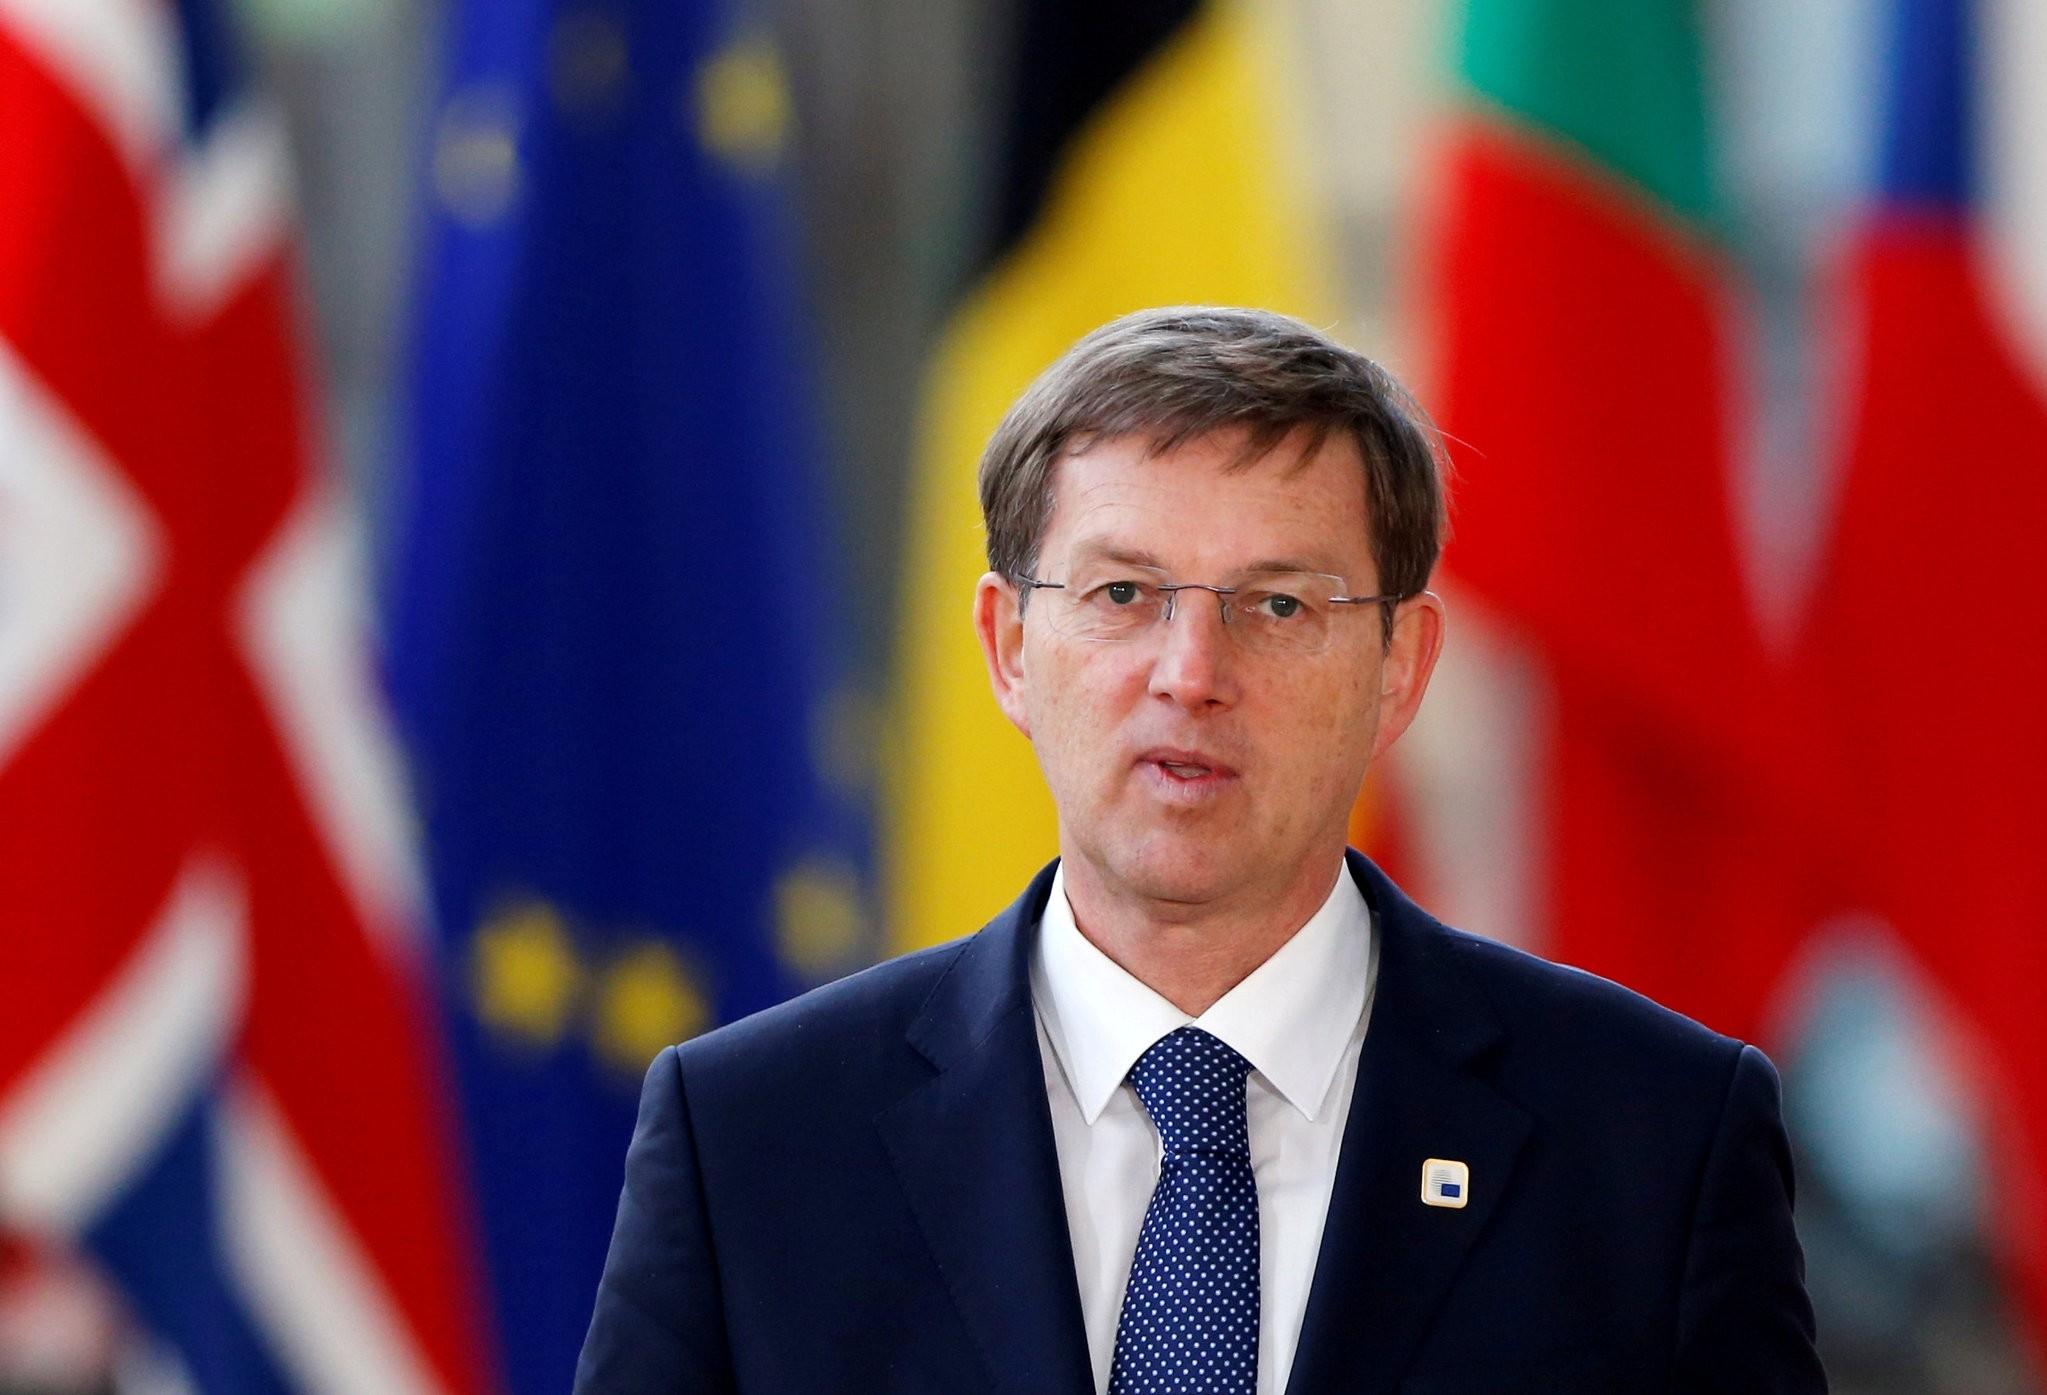 Slovenia's Prime Minister Miro Cerar arrives at a European Union leaders summit in Brussels, Belgium (Reuters Photo)